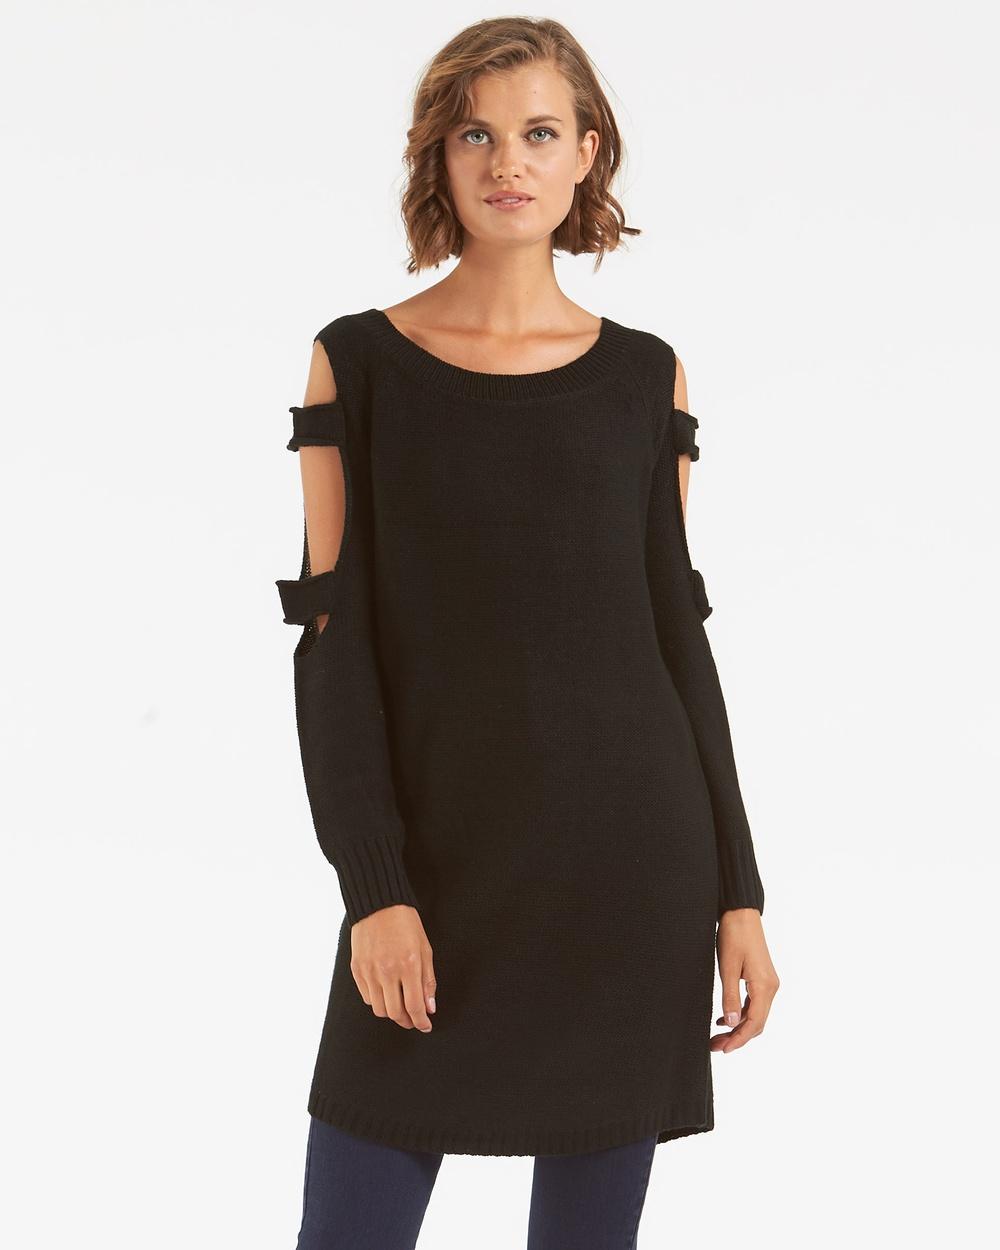 Amelius Harper Knit Dress Tops Black Harper Knit Dress